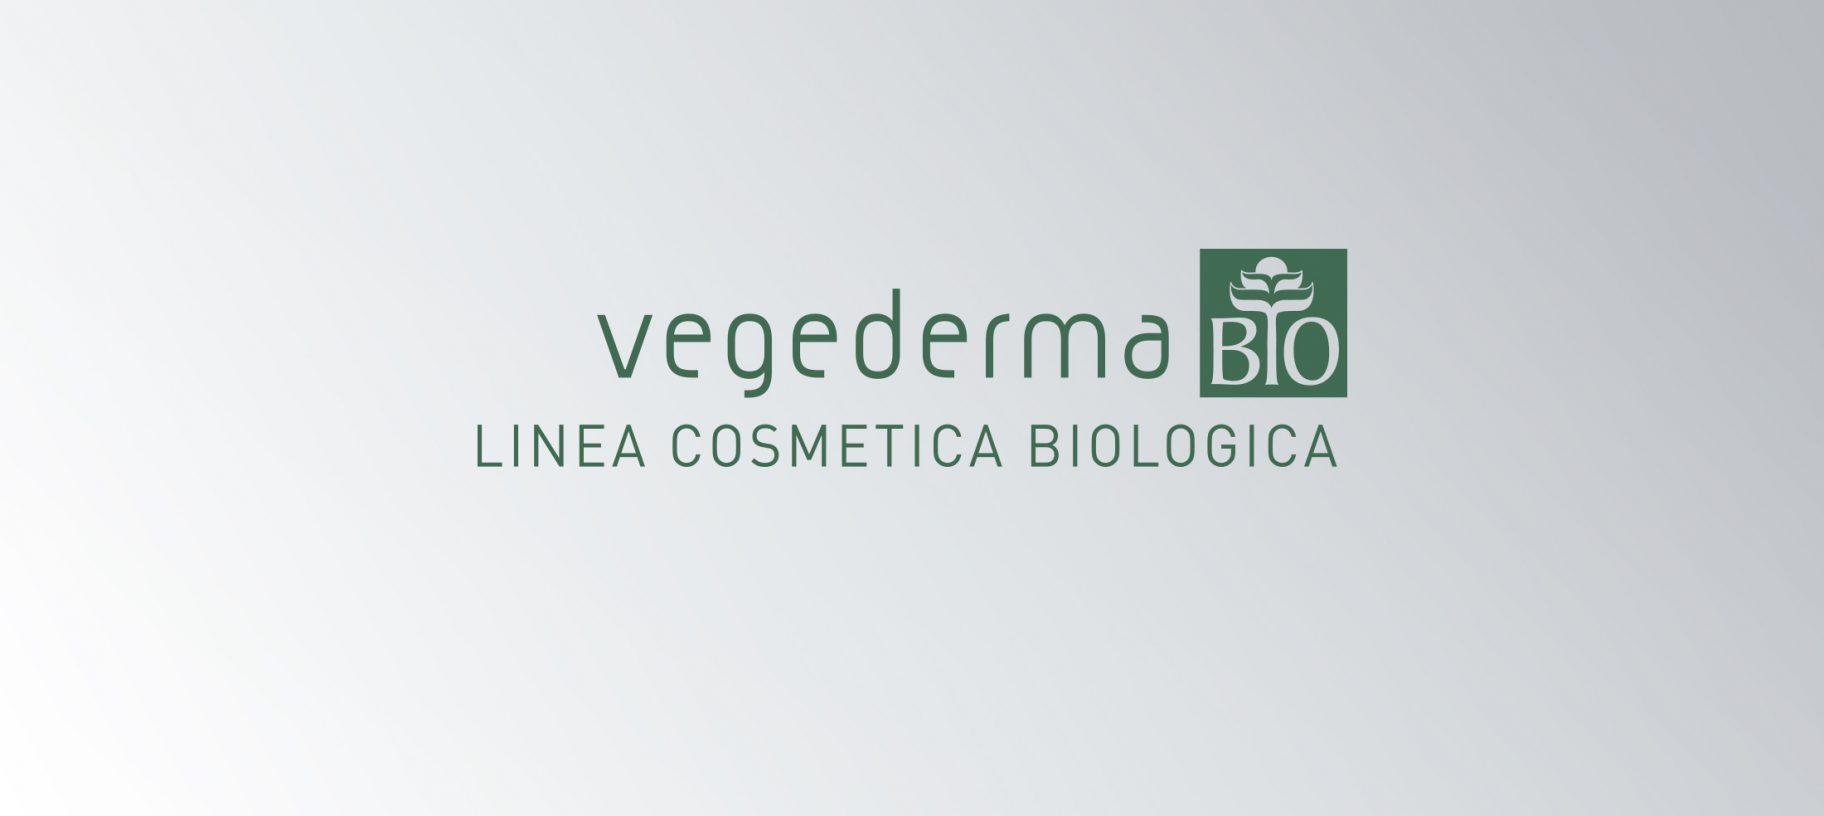 BEAUTIMPORT VegedermaBIO-logo